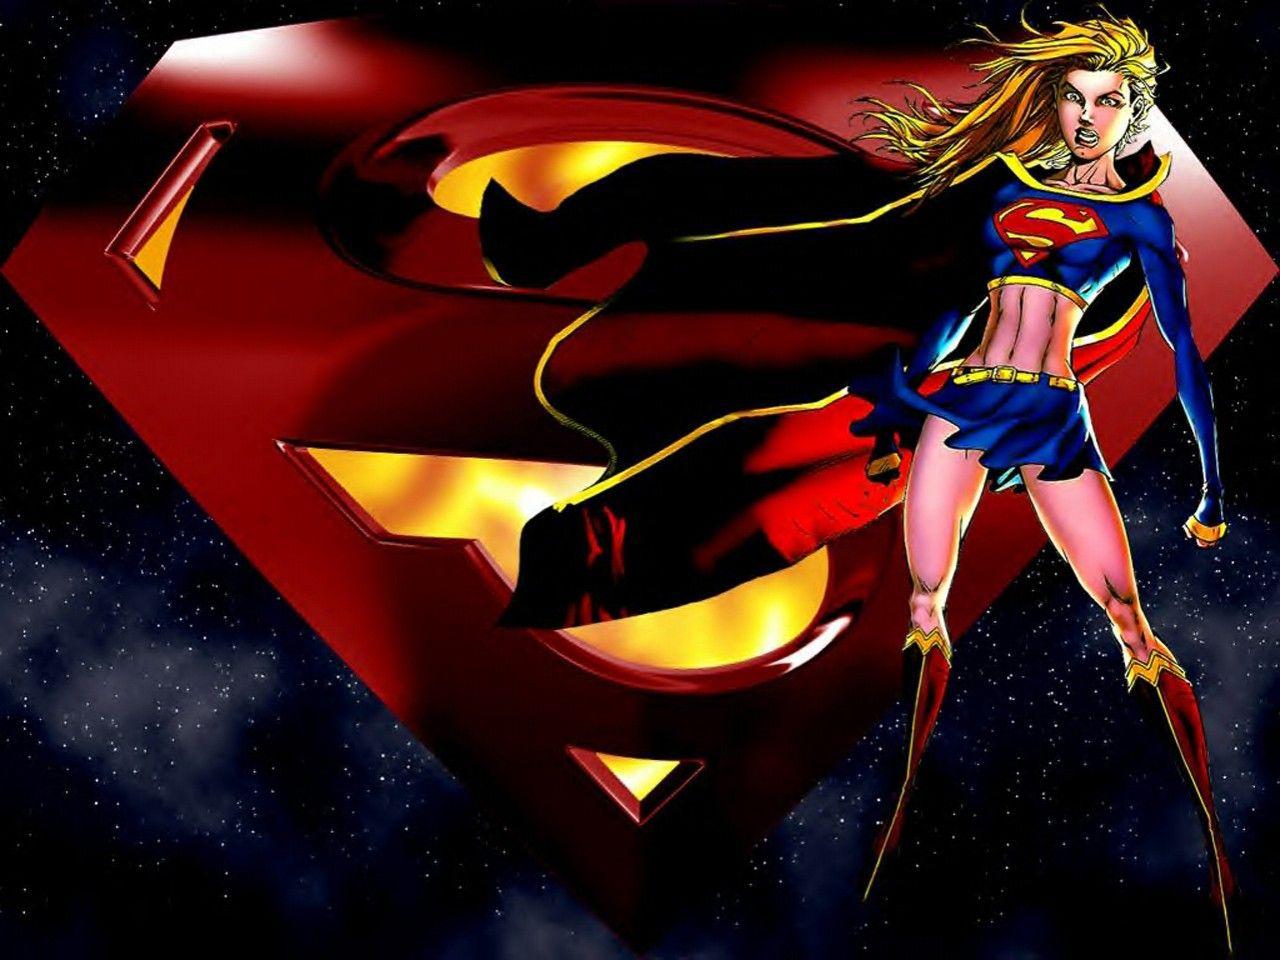 Wonderful Wallpaper Logo Supergirl - ec4e86e18436c3bdfba45b0ed22549a3  Pic_94837.jpg